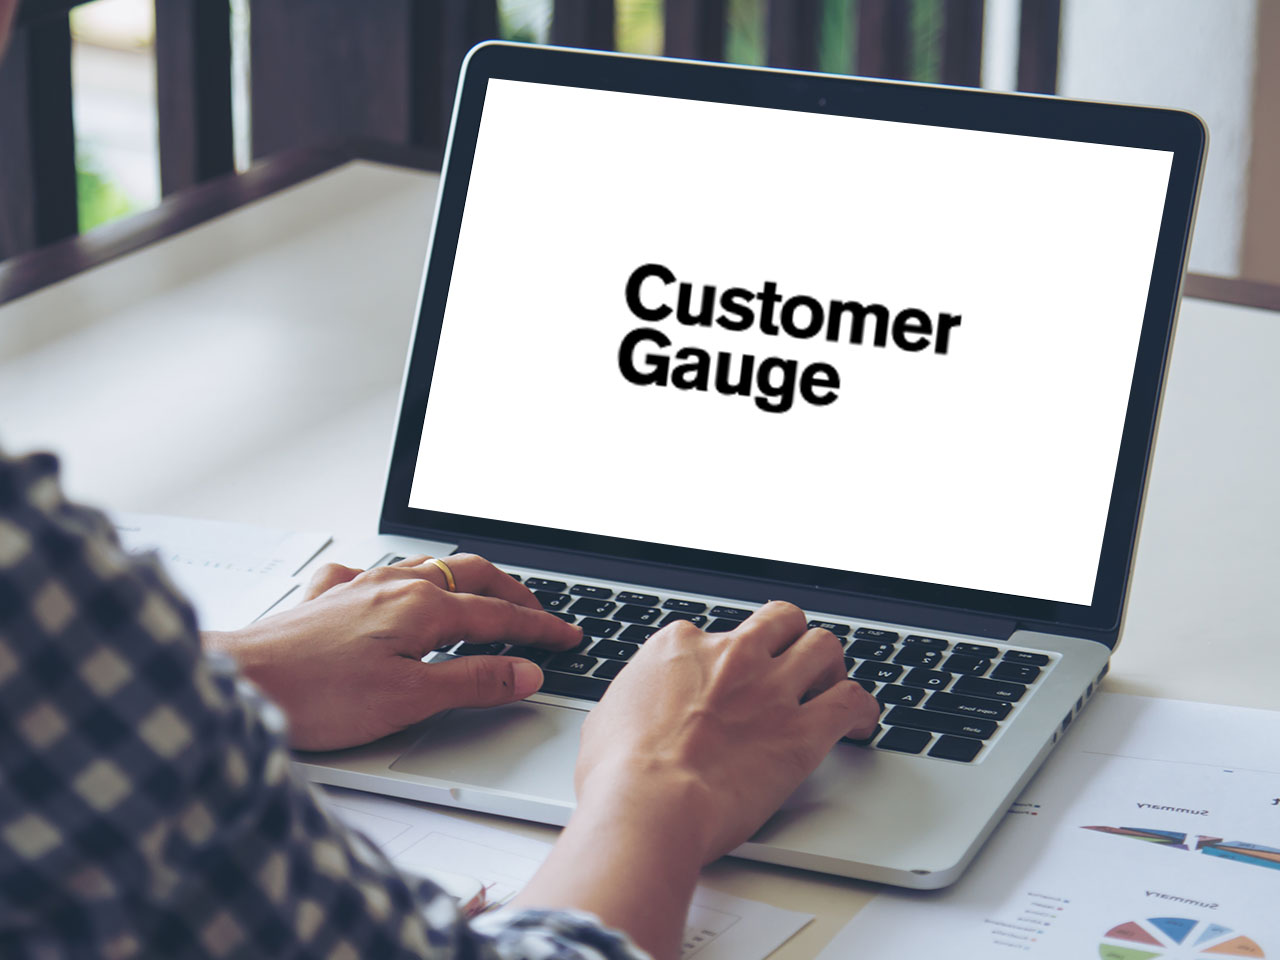 laptop screen with CustomerGauge logo